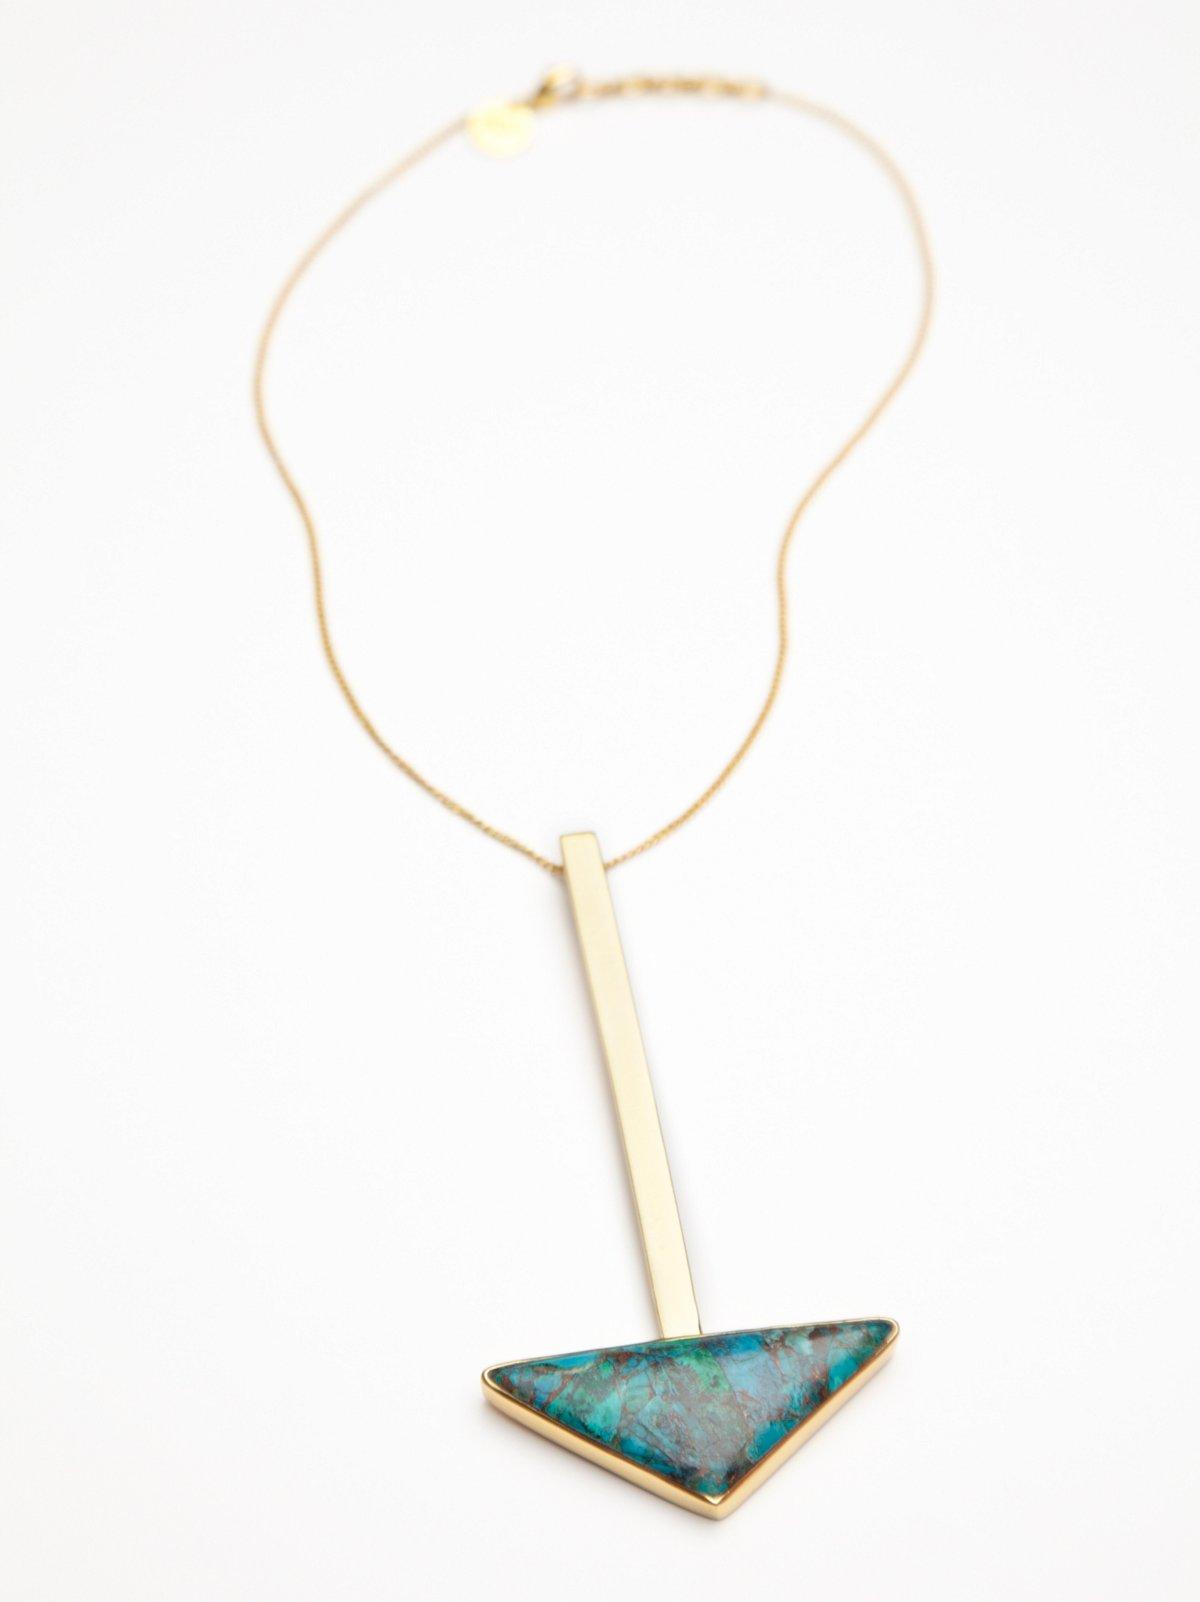 Su Necklace Pendant